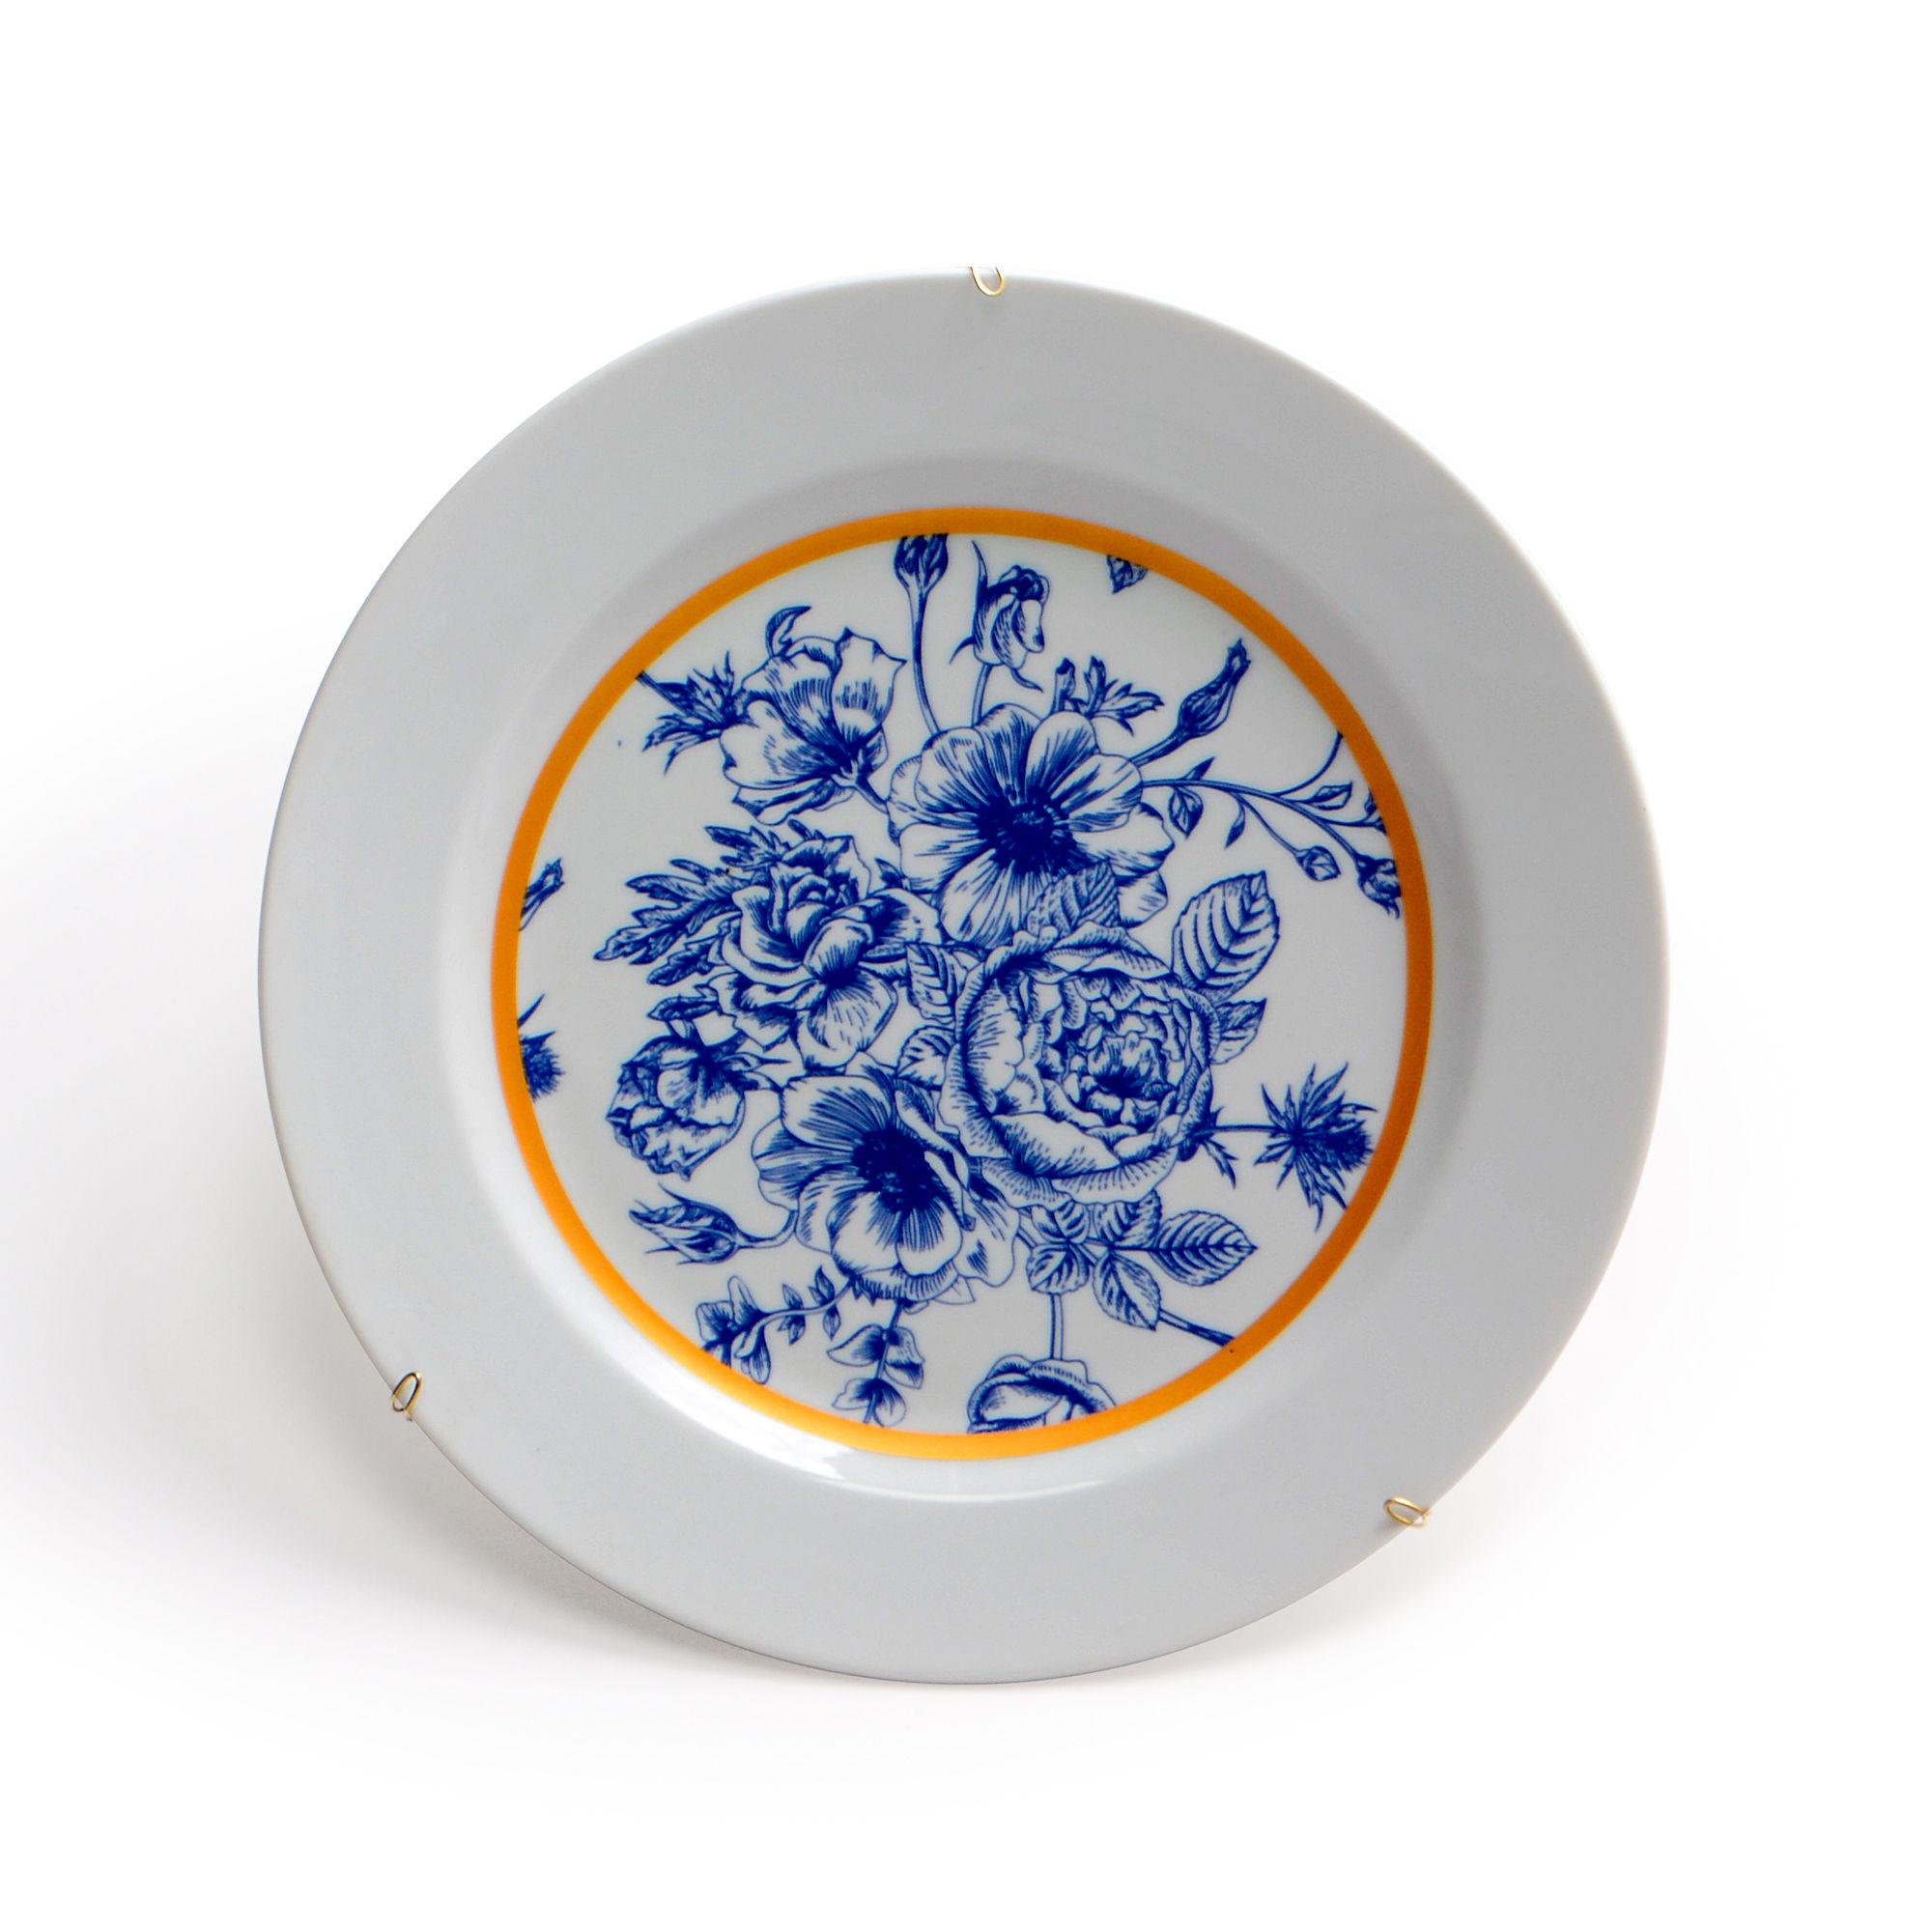 Prato de parede de porcelana Floral Azul